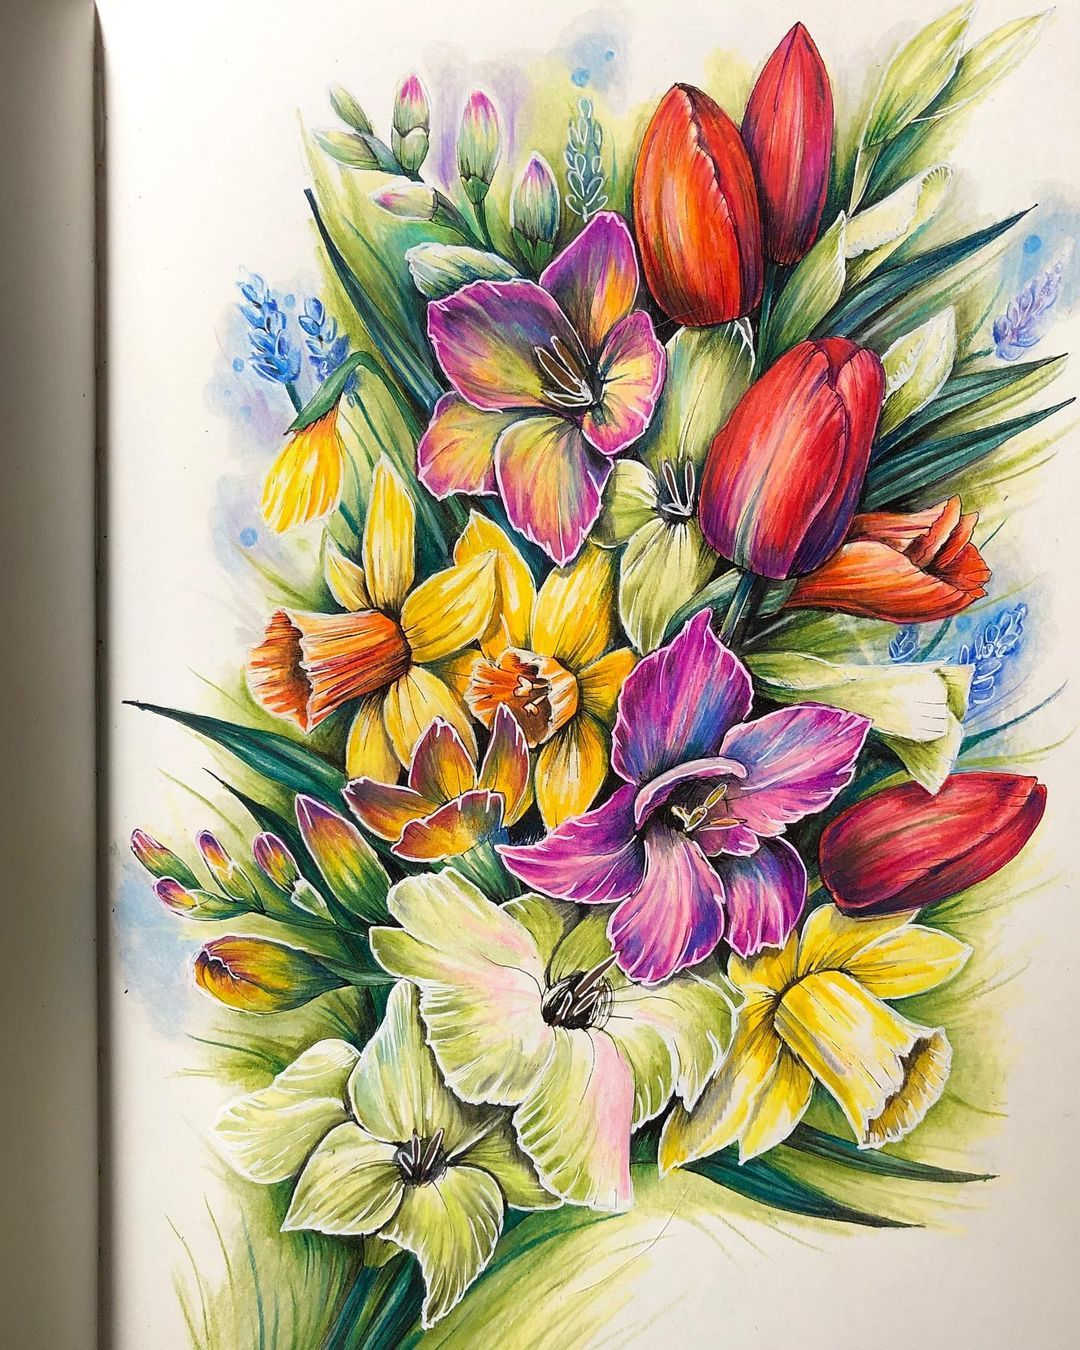 Gefallt 102 Mal 3 Kommentare Petra Gescheidtova Colourful Peeta Auf Instagram Testing My New Posca Pencils Sedmikvit Instagram Petra Gefallt